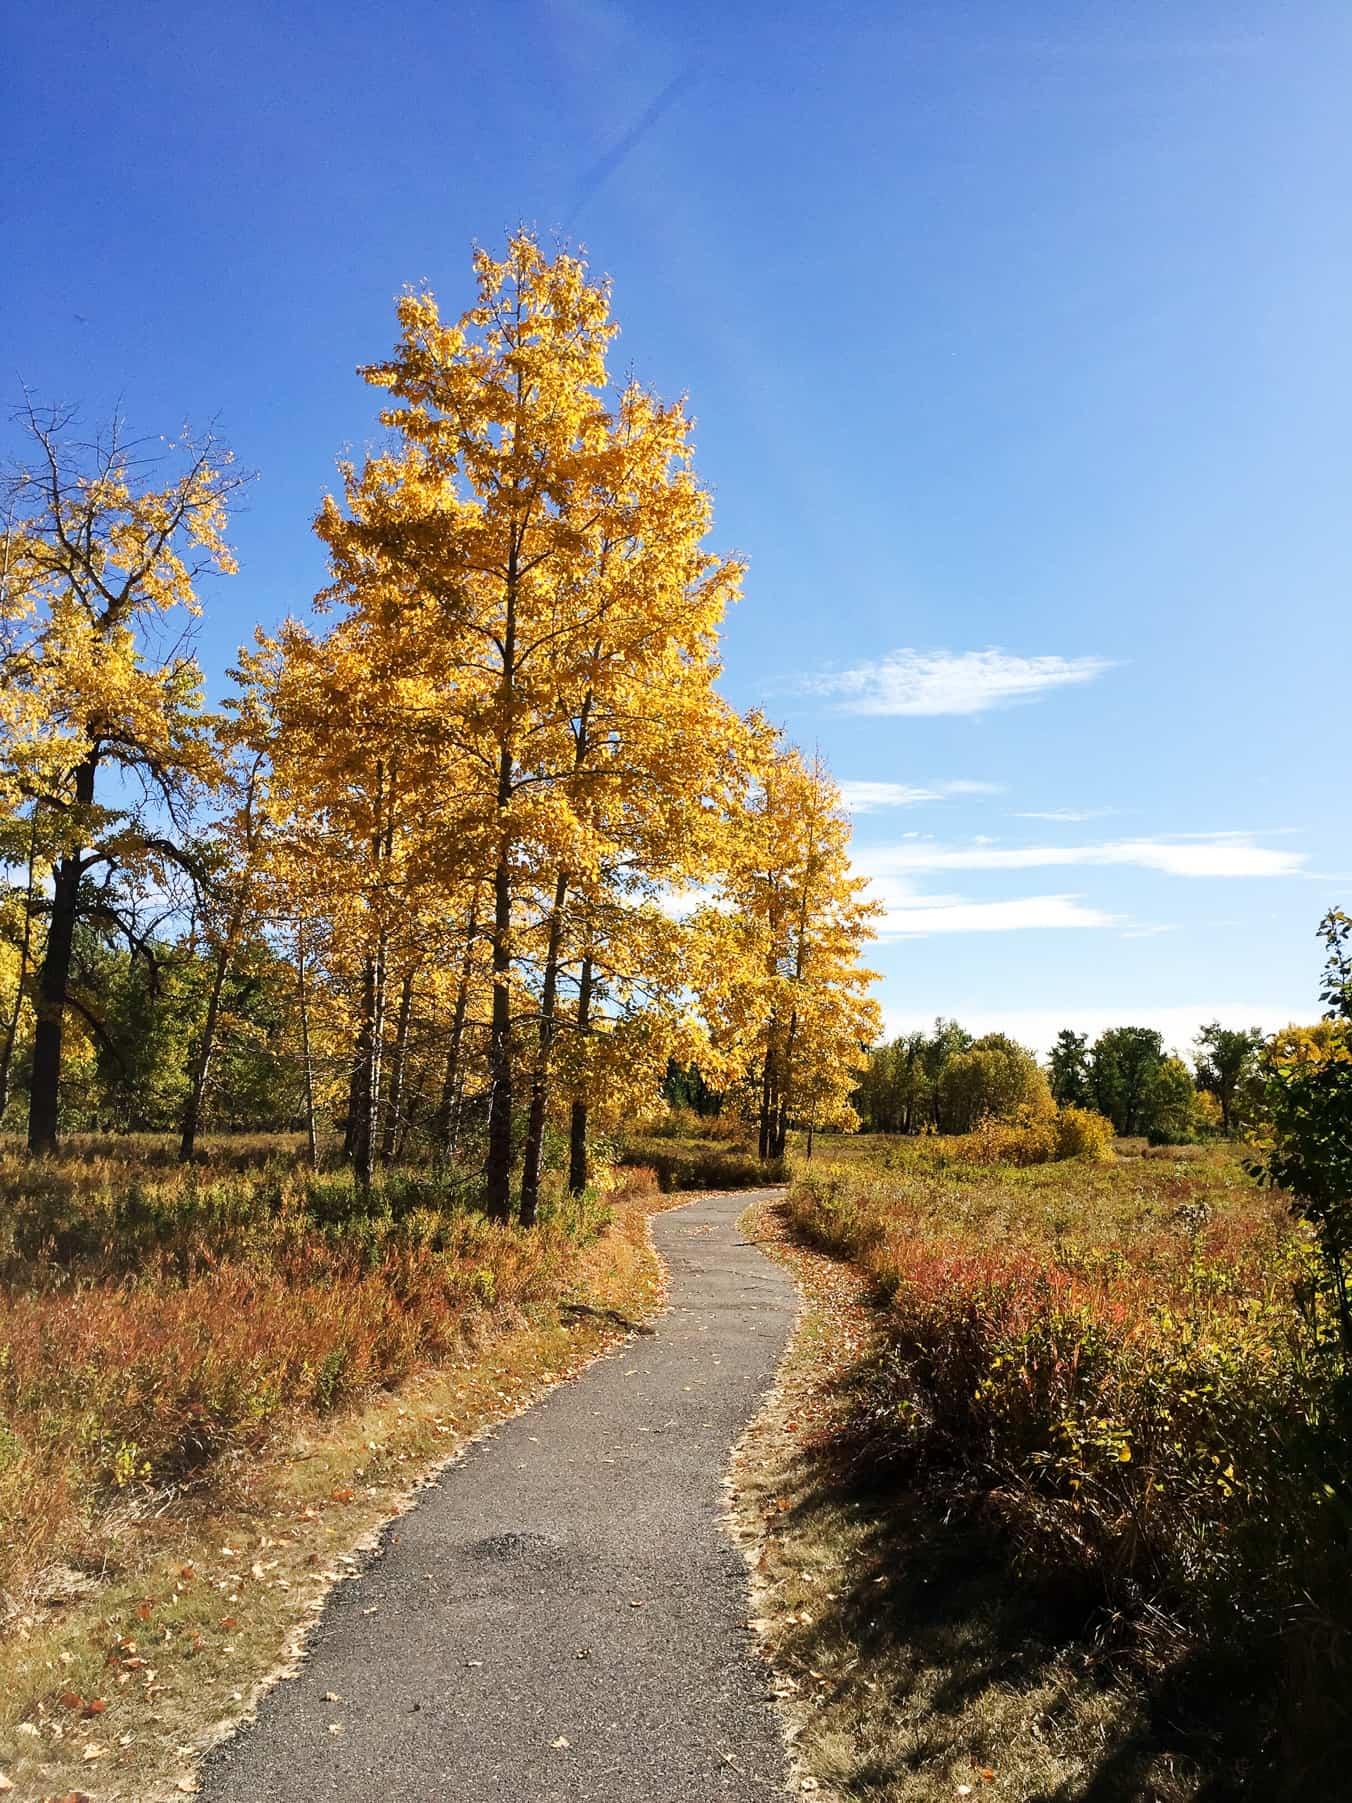 5 Reasons to Visit Fish Creek Provincial Park in Fall